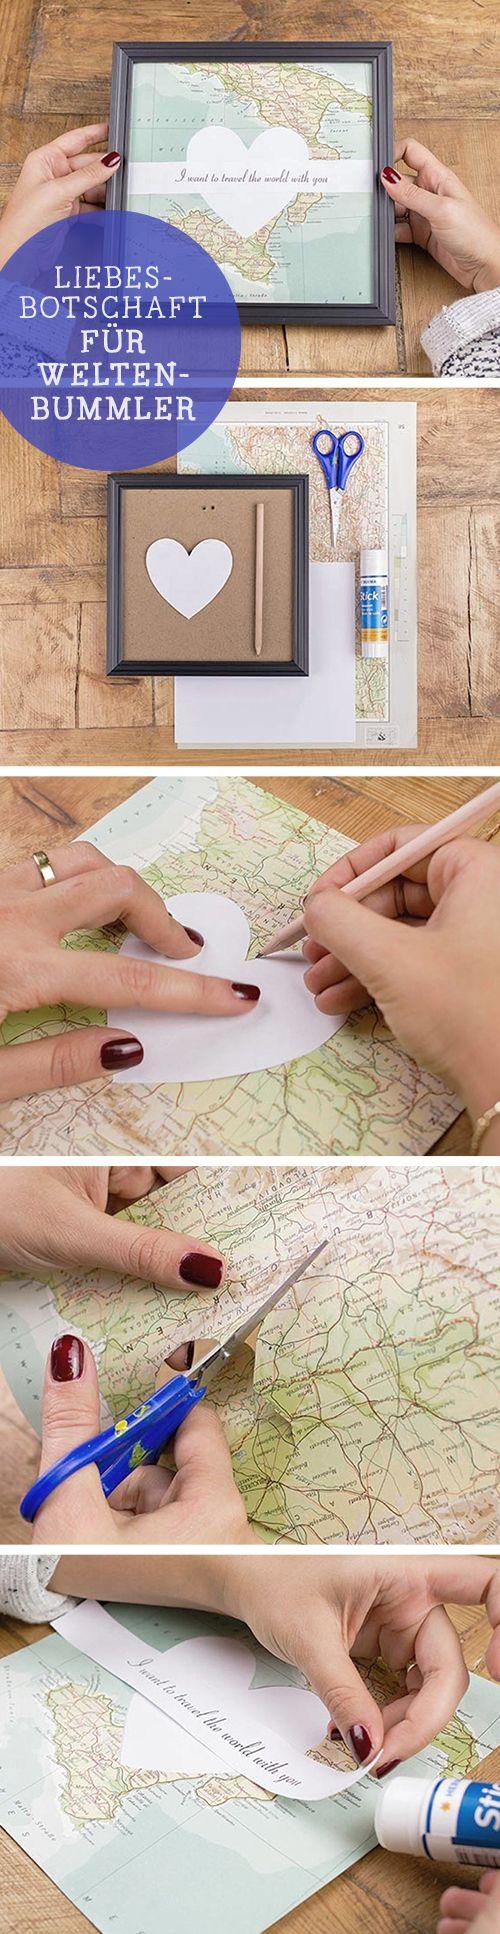 DIY Geburtstagsgeschenk: Liebesbotschaft für Weltenbummler, Landkarte / diy tutorial: gift idea for traveller, vacation, map via DaWanda.com